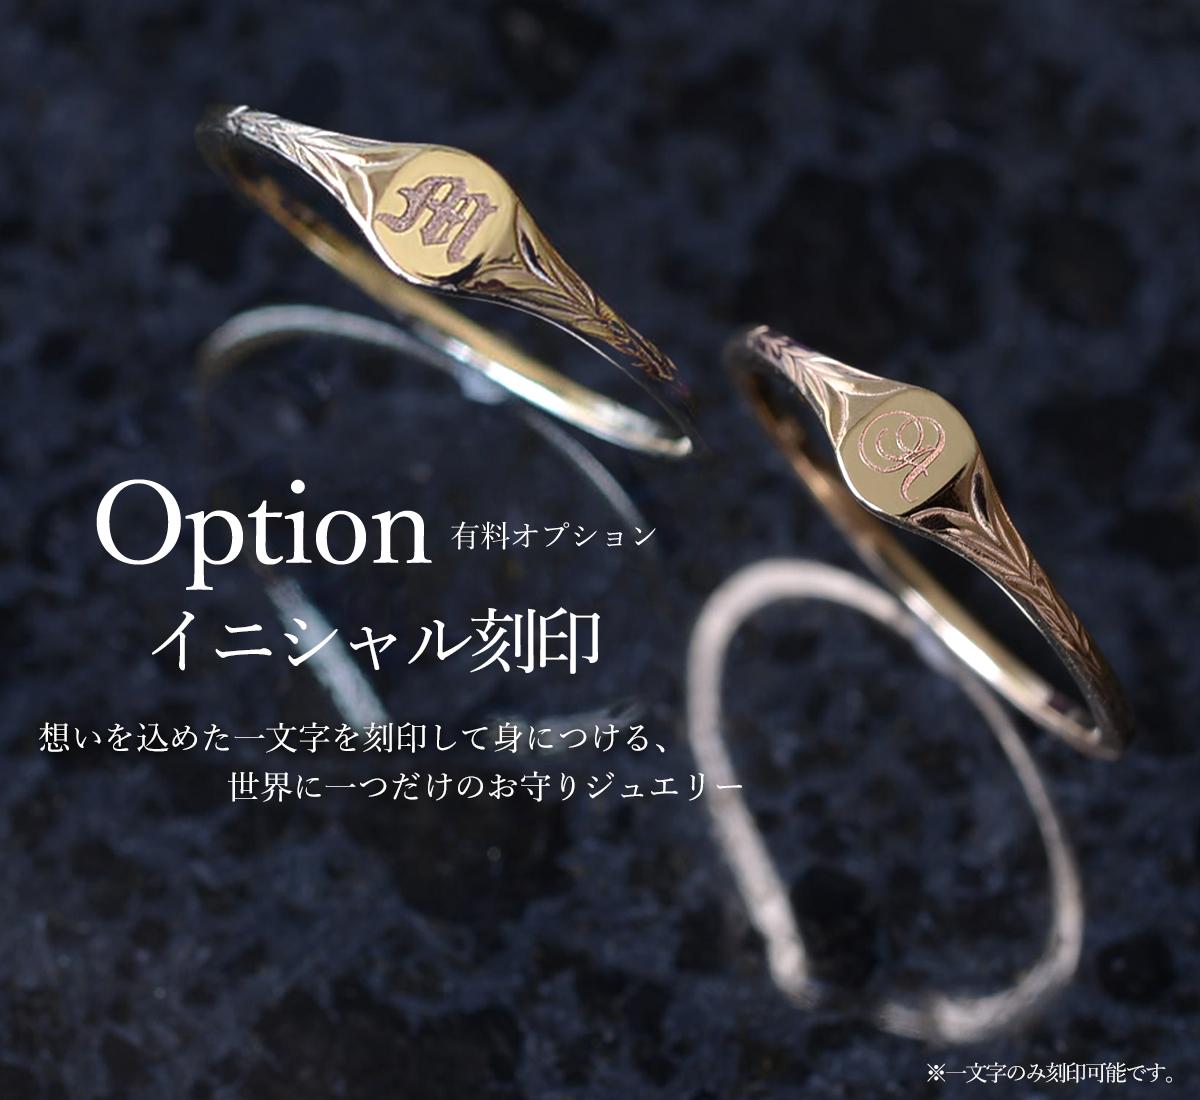 ari1675専用【オプション】イニシャル刻印